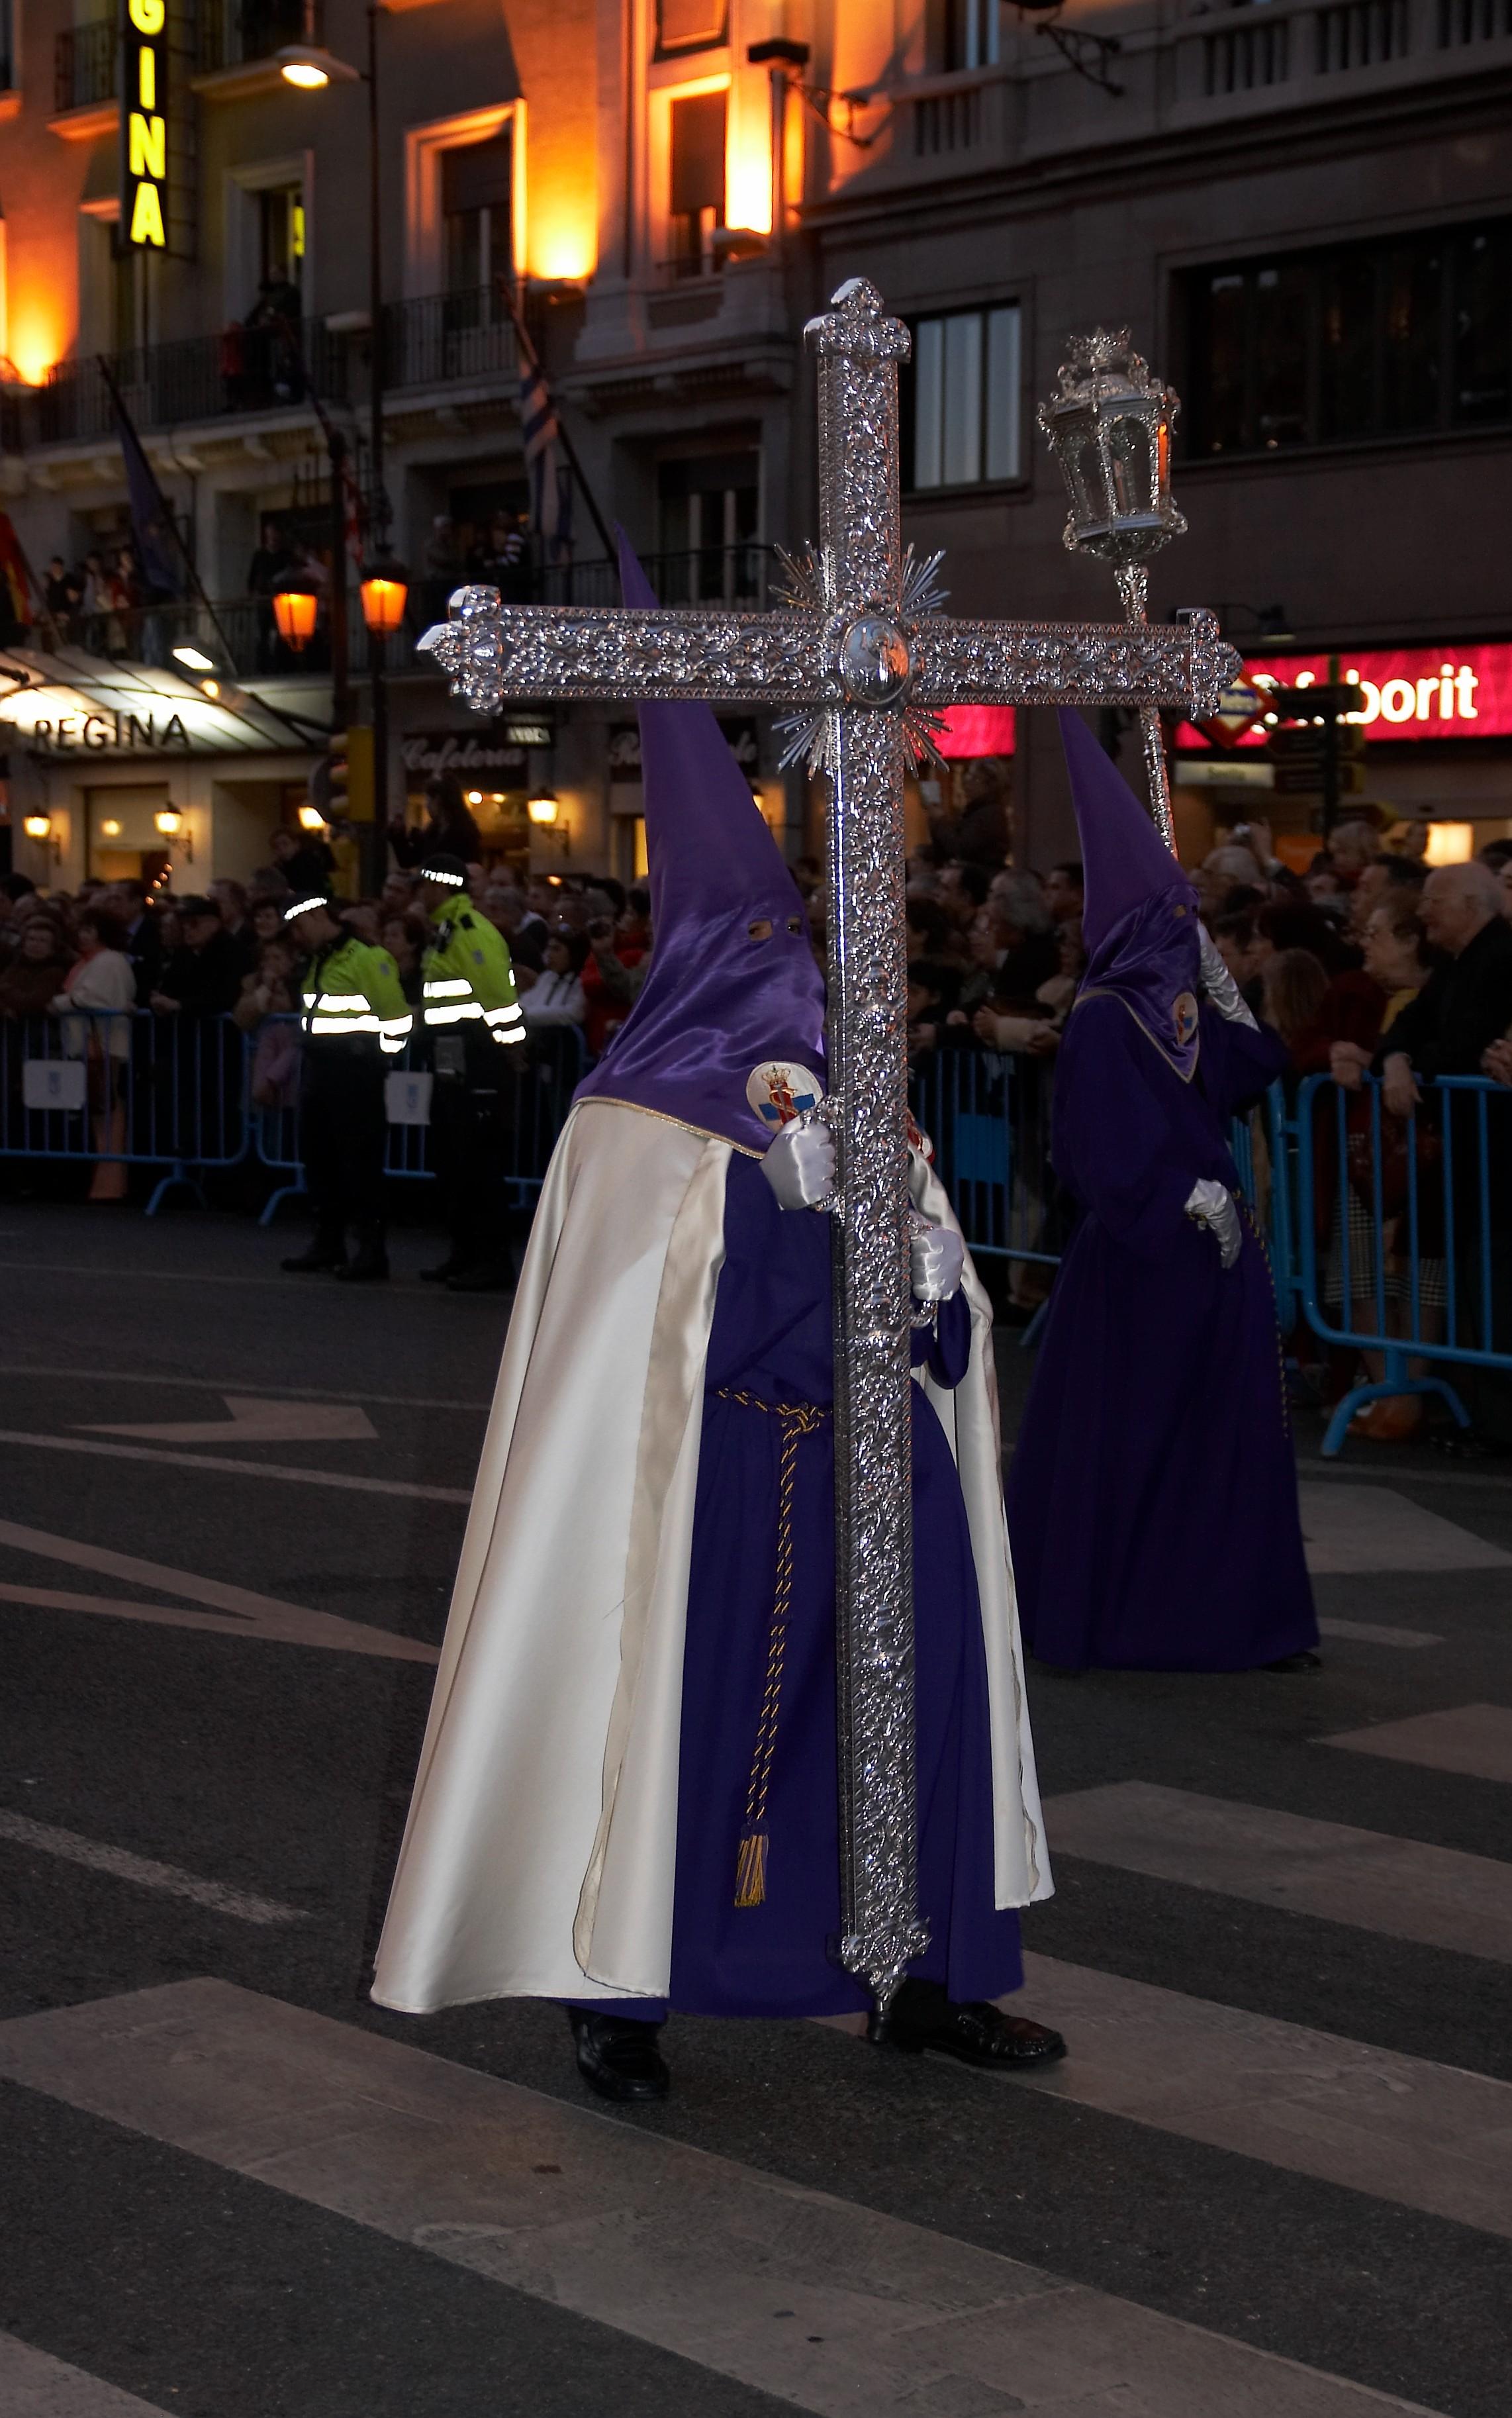 Depiction of Semana Santa en Madrid